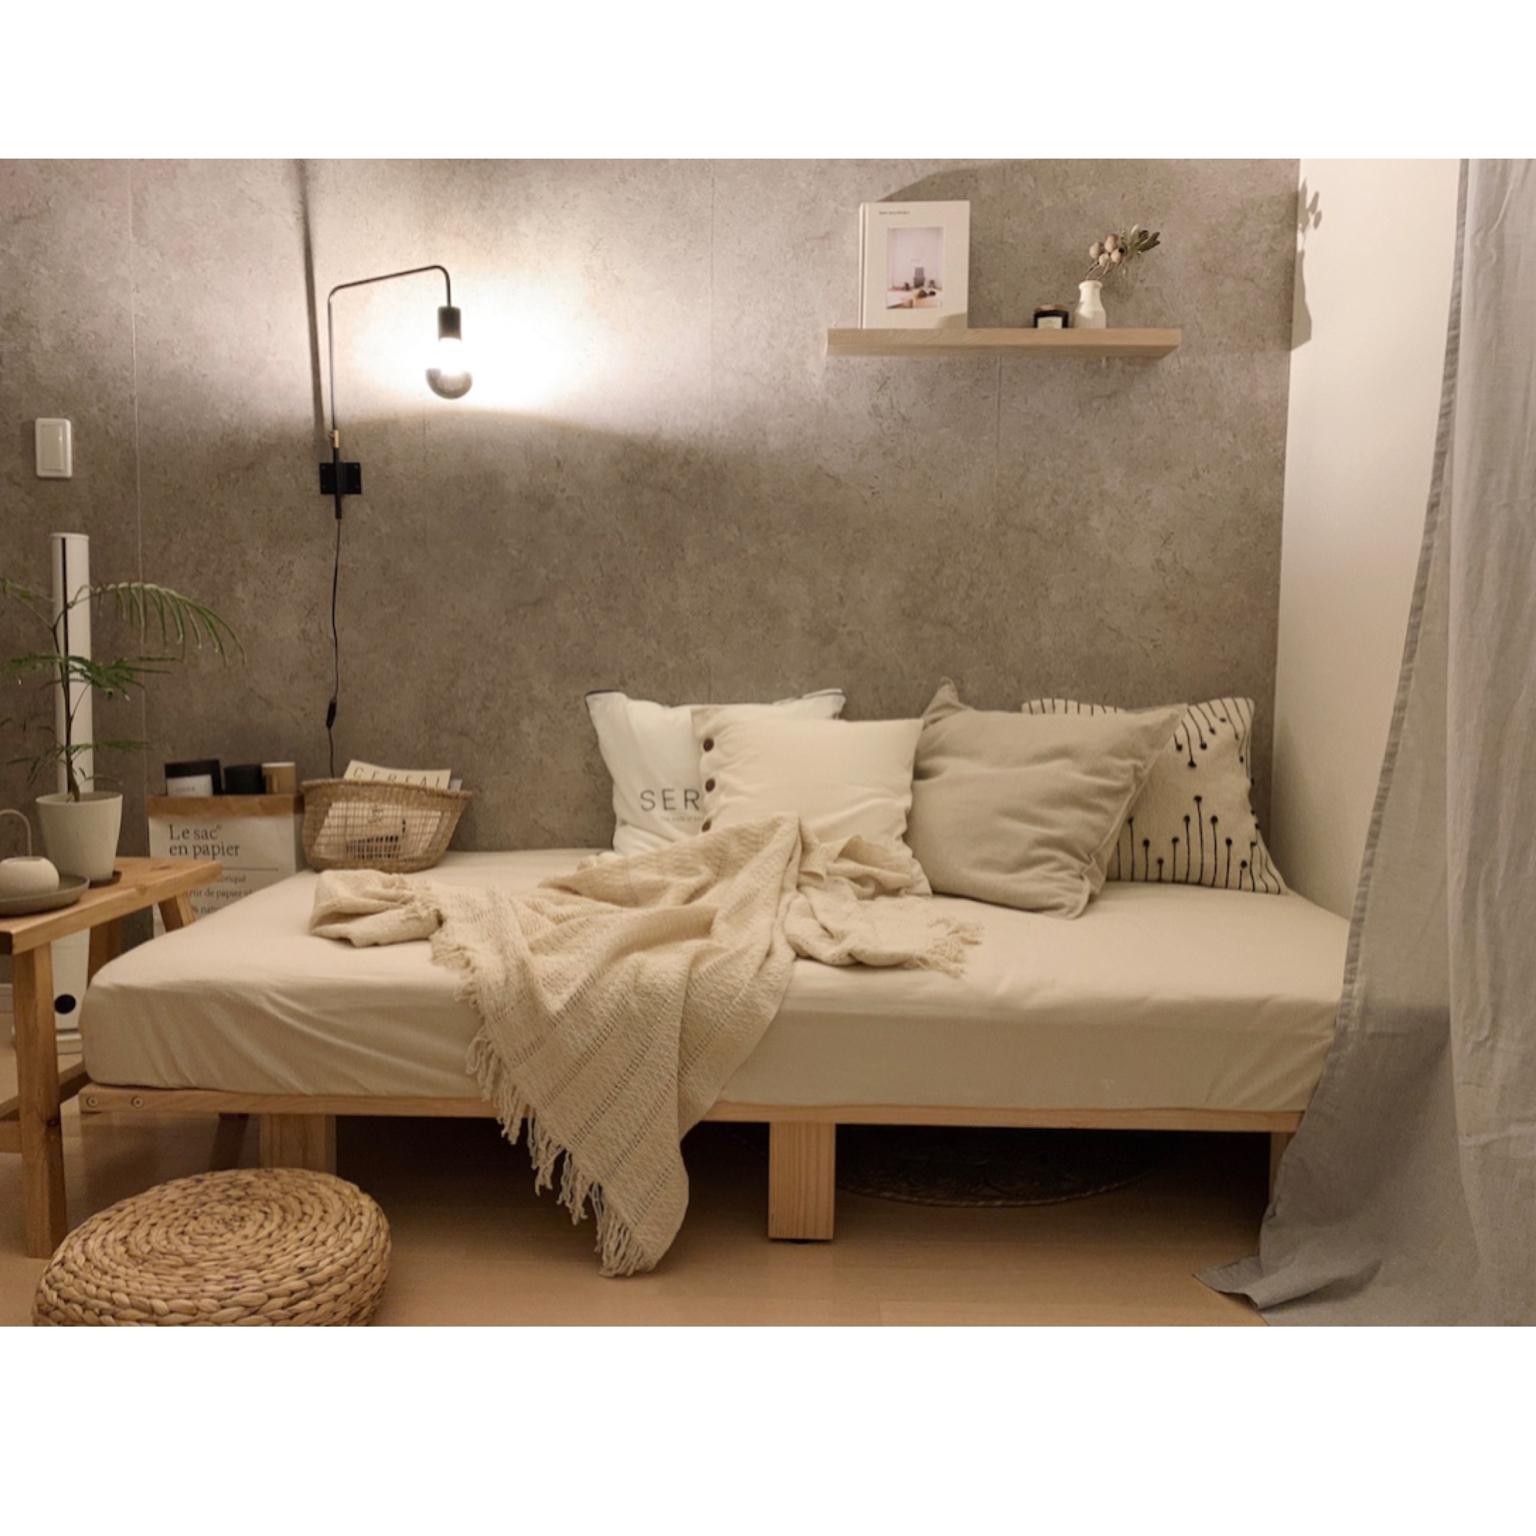 IKEA/ニトリ/ヒヤシンススツール/クッション/コンクリート風壁紙...などのインテリア実例 - 2021-04-22 21:23:45